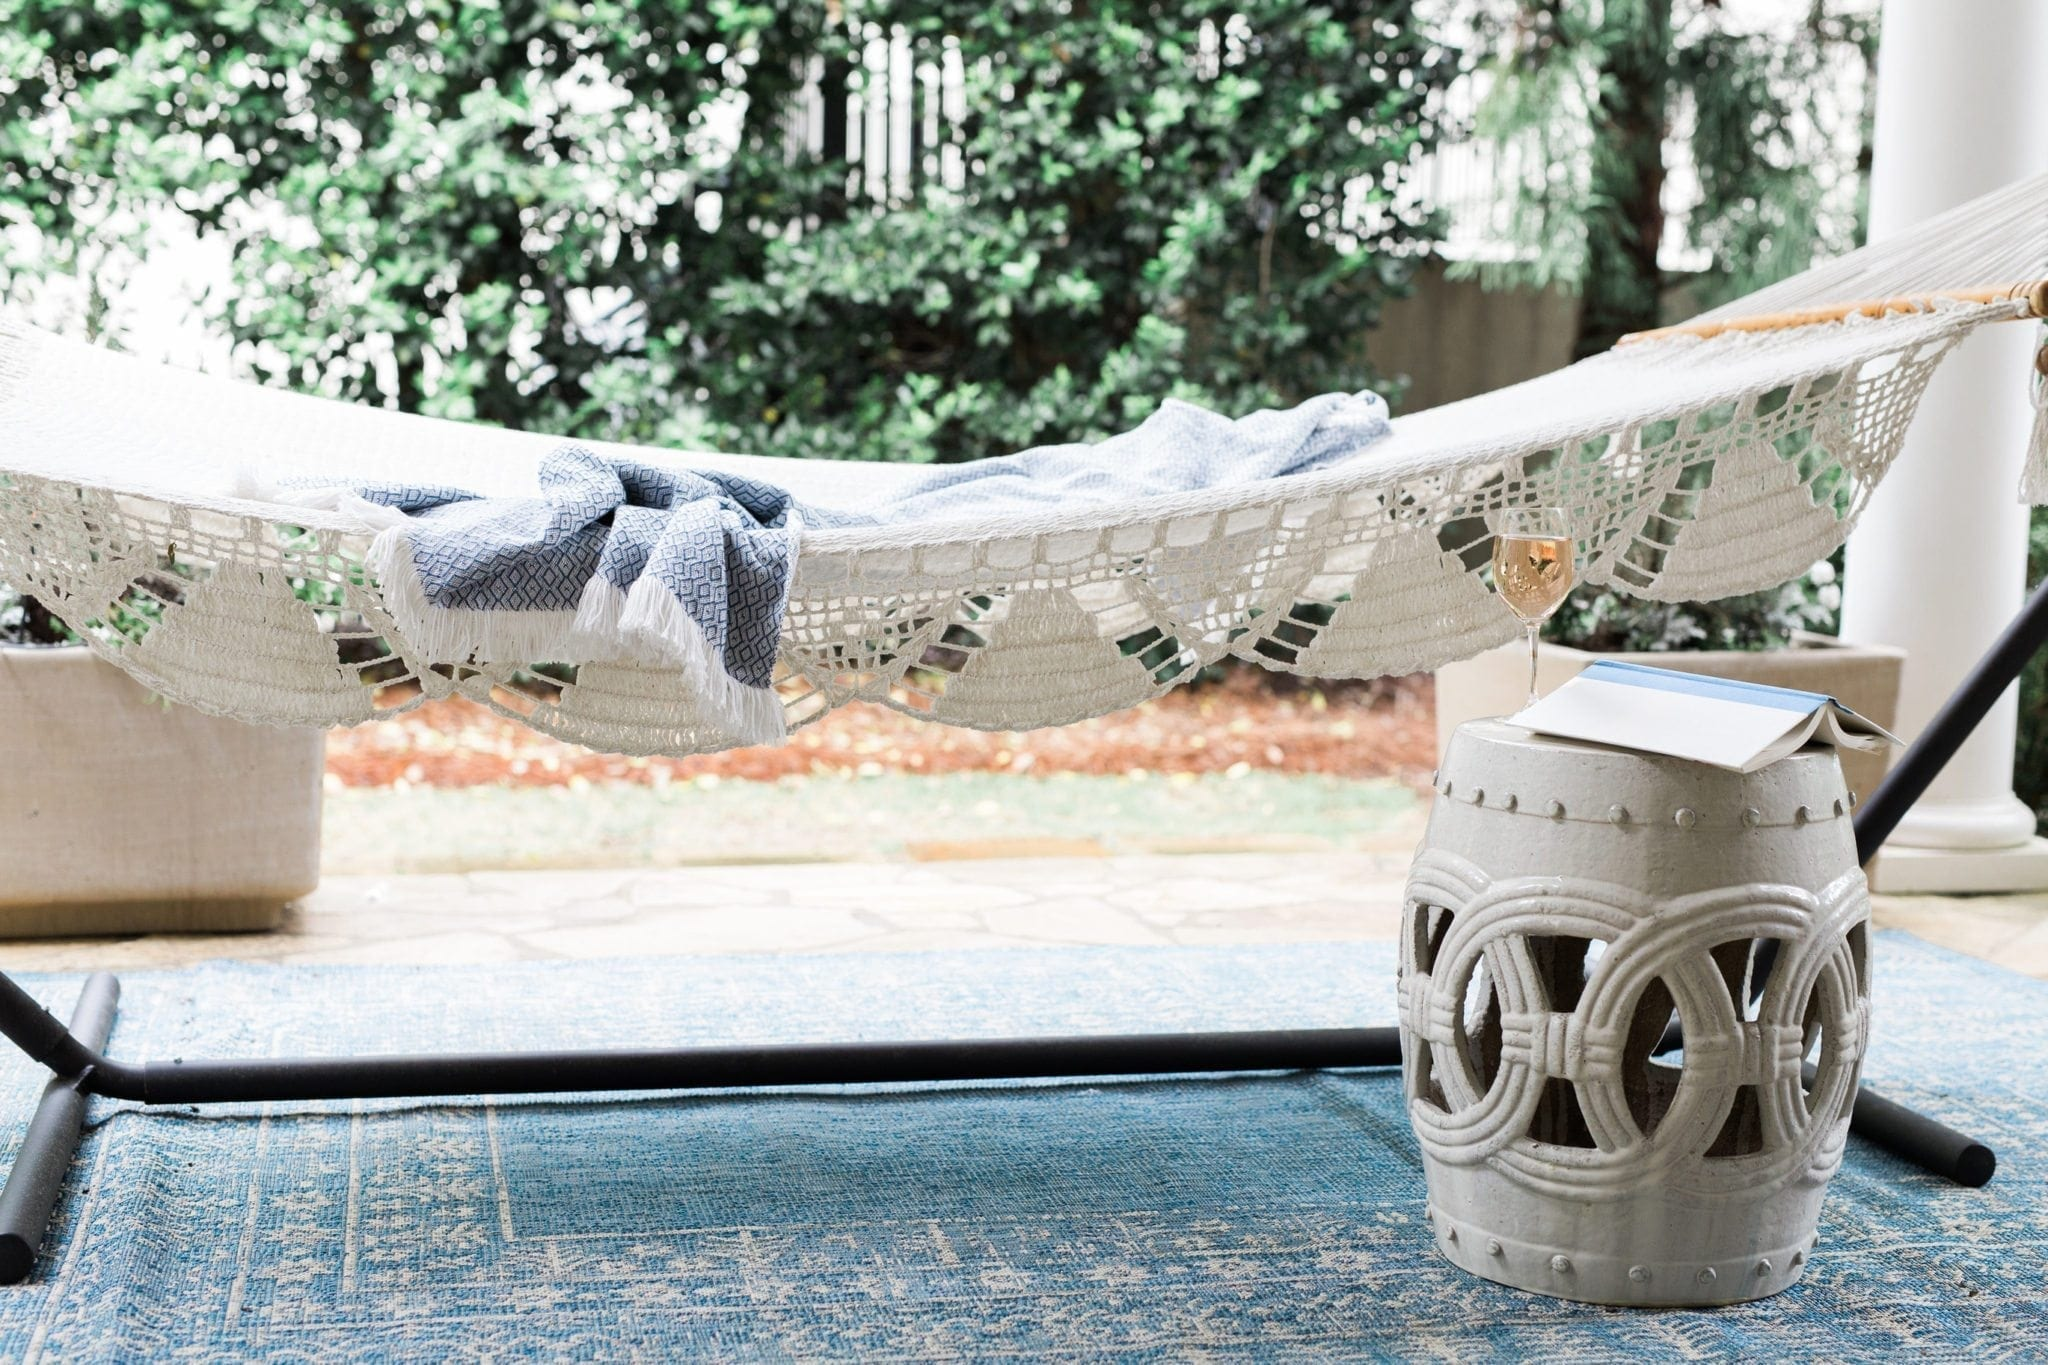 Outdoor woven hammock